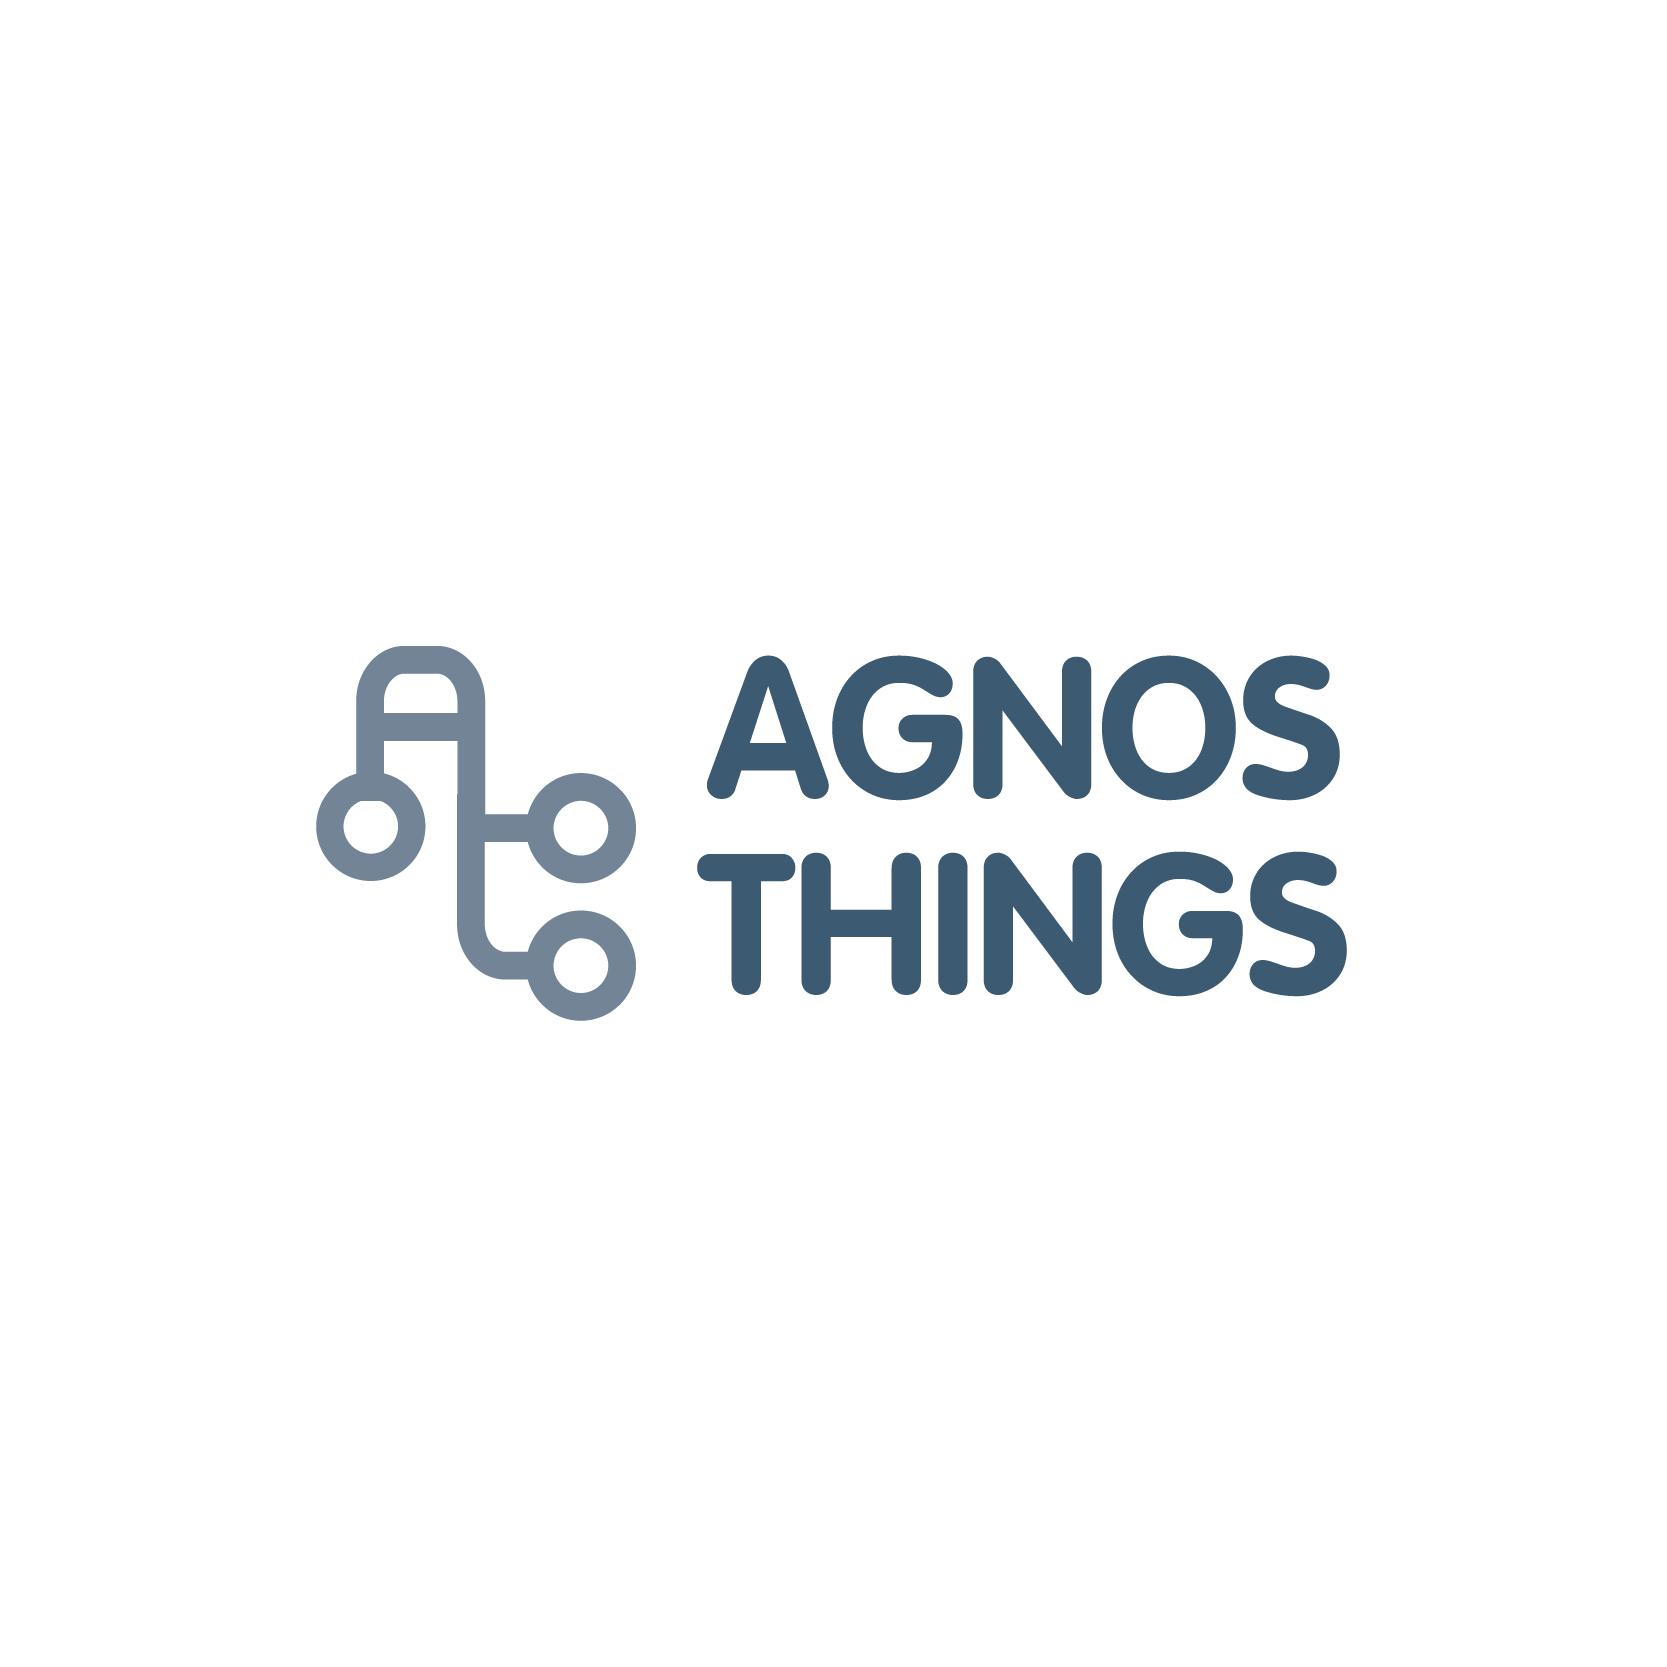 AgnosThings Surabaya Developer Meetup